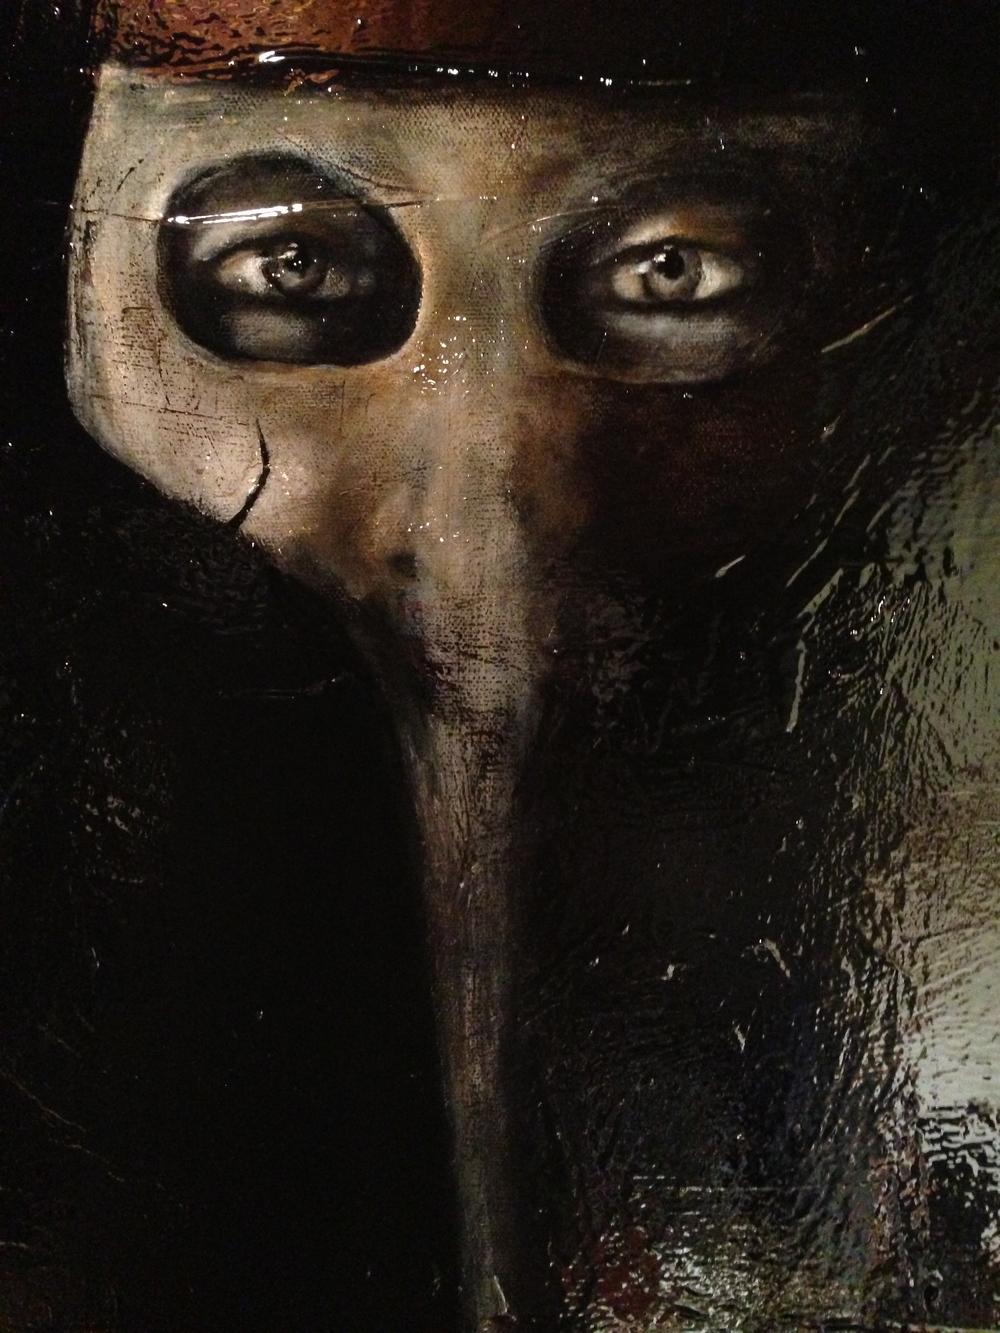 Maschera di arte, 2014    Acrylic & oil on canvas